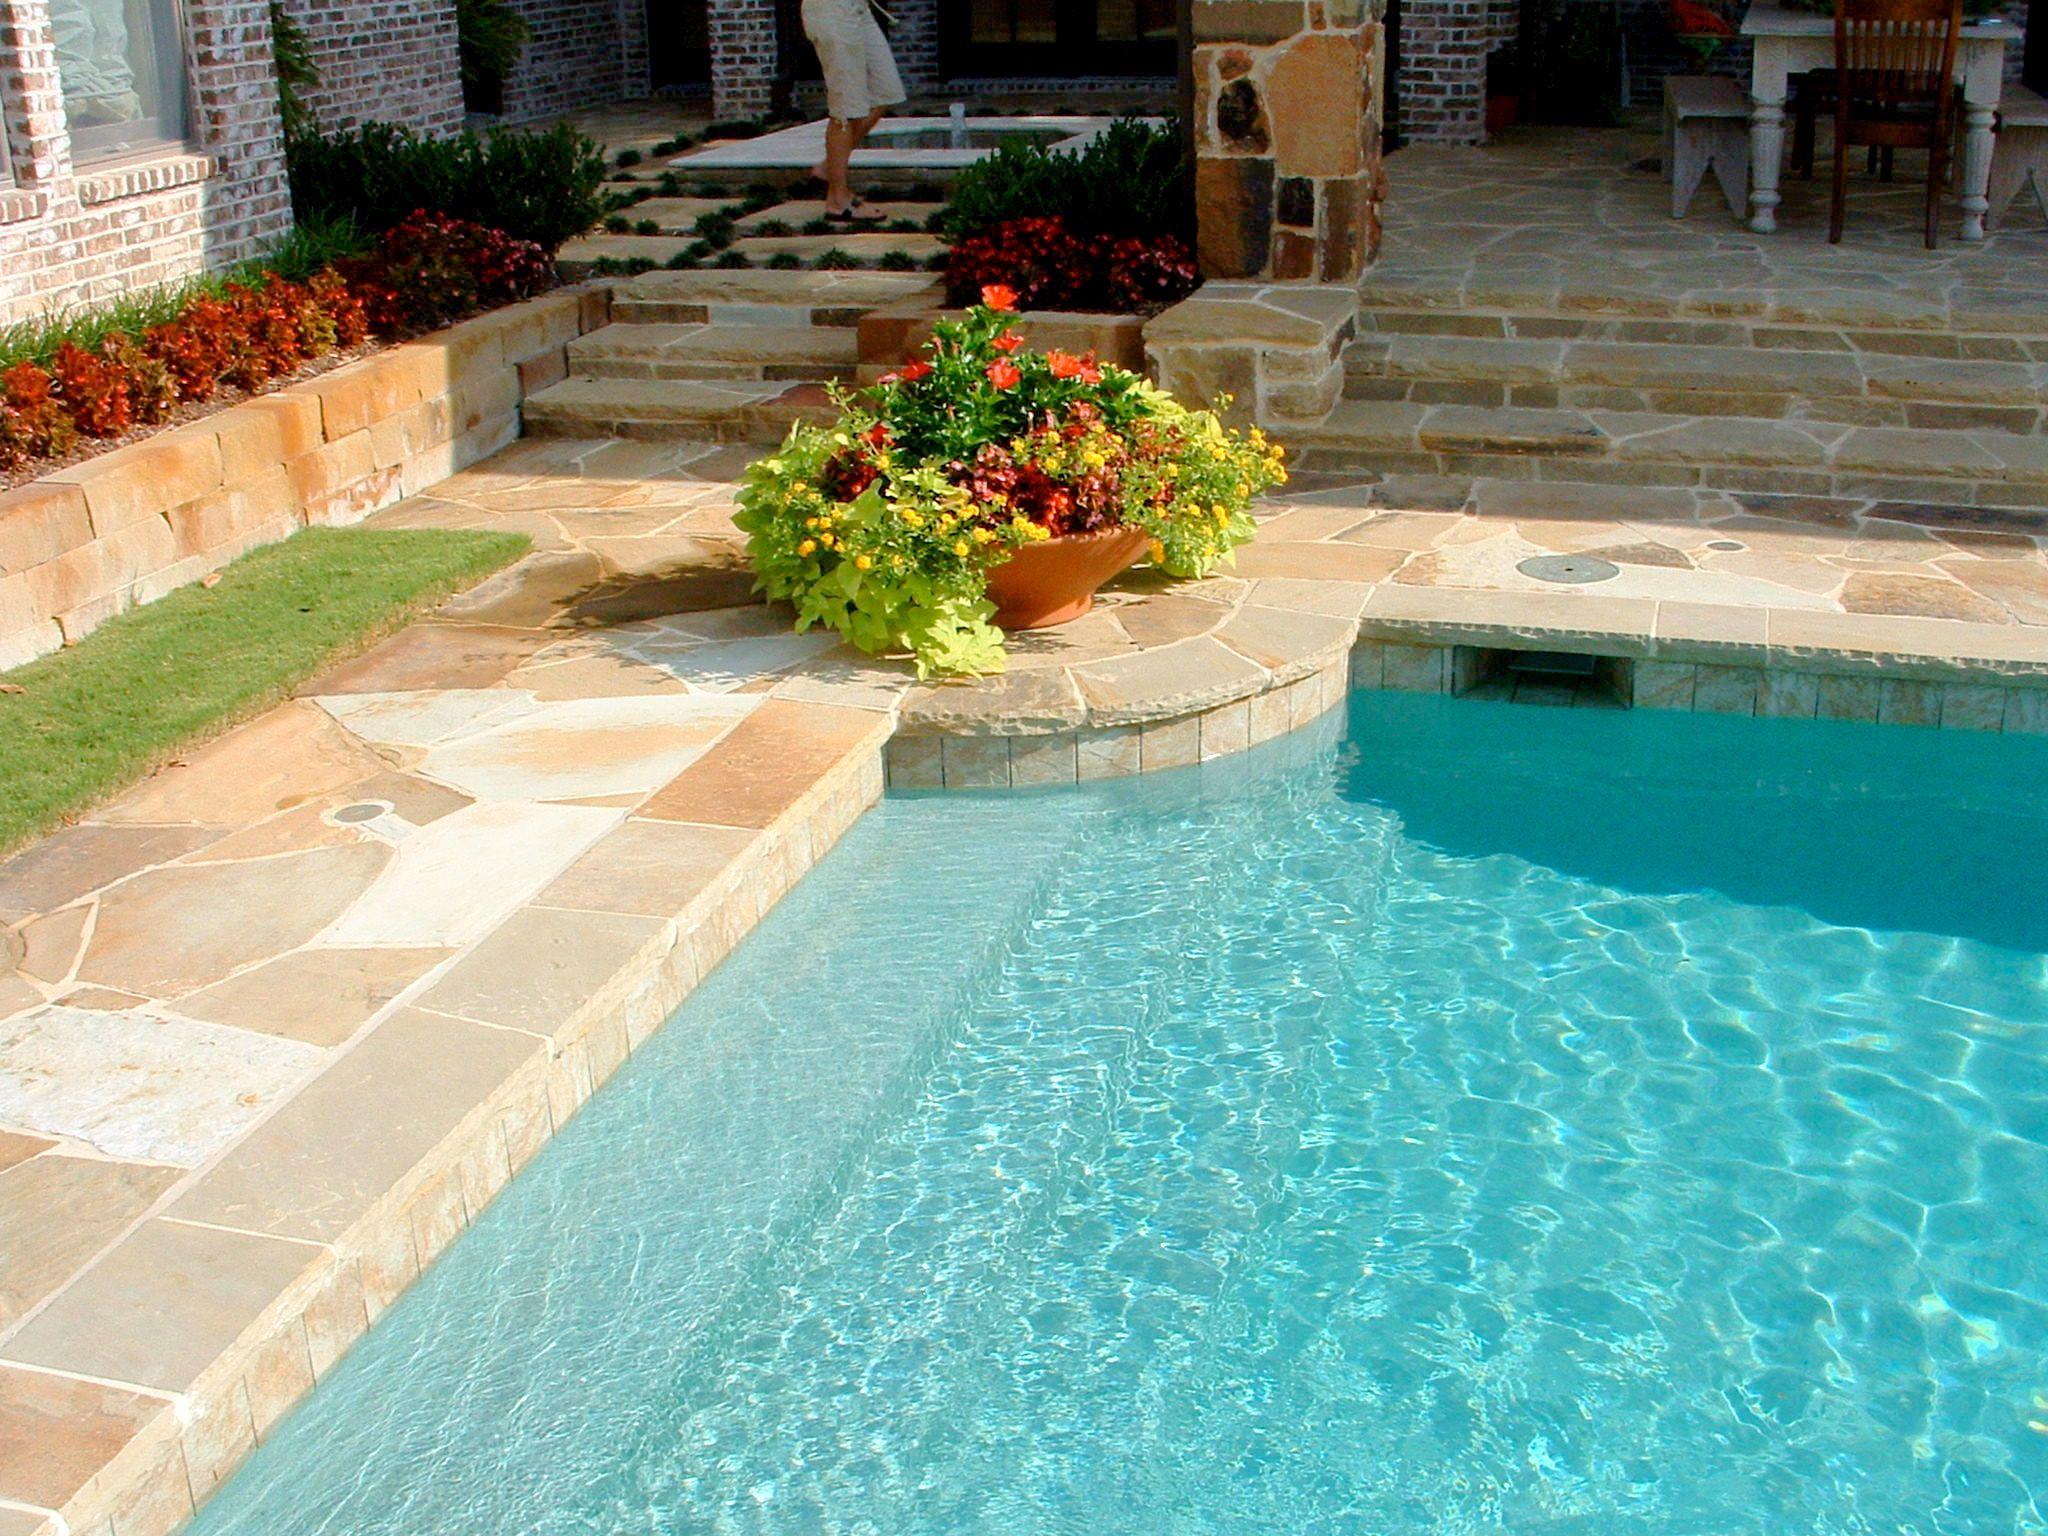 Flagstone Swimming Pool Deck Formal Pool Fort Worth Oklahoma Flagstone Pool Proj 13 Jpg